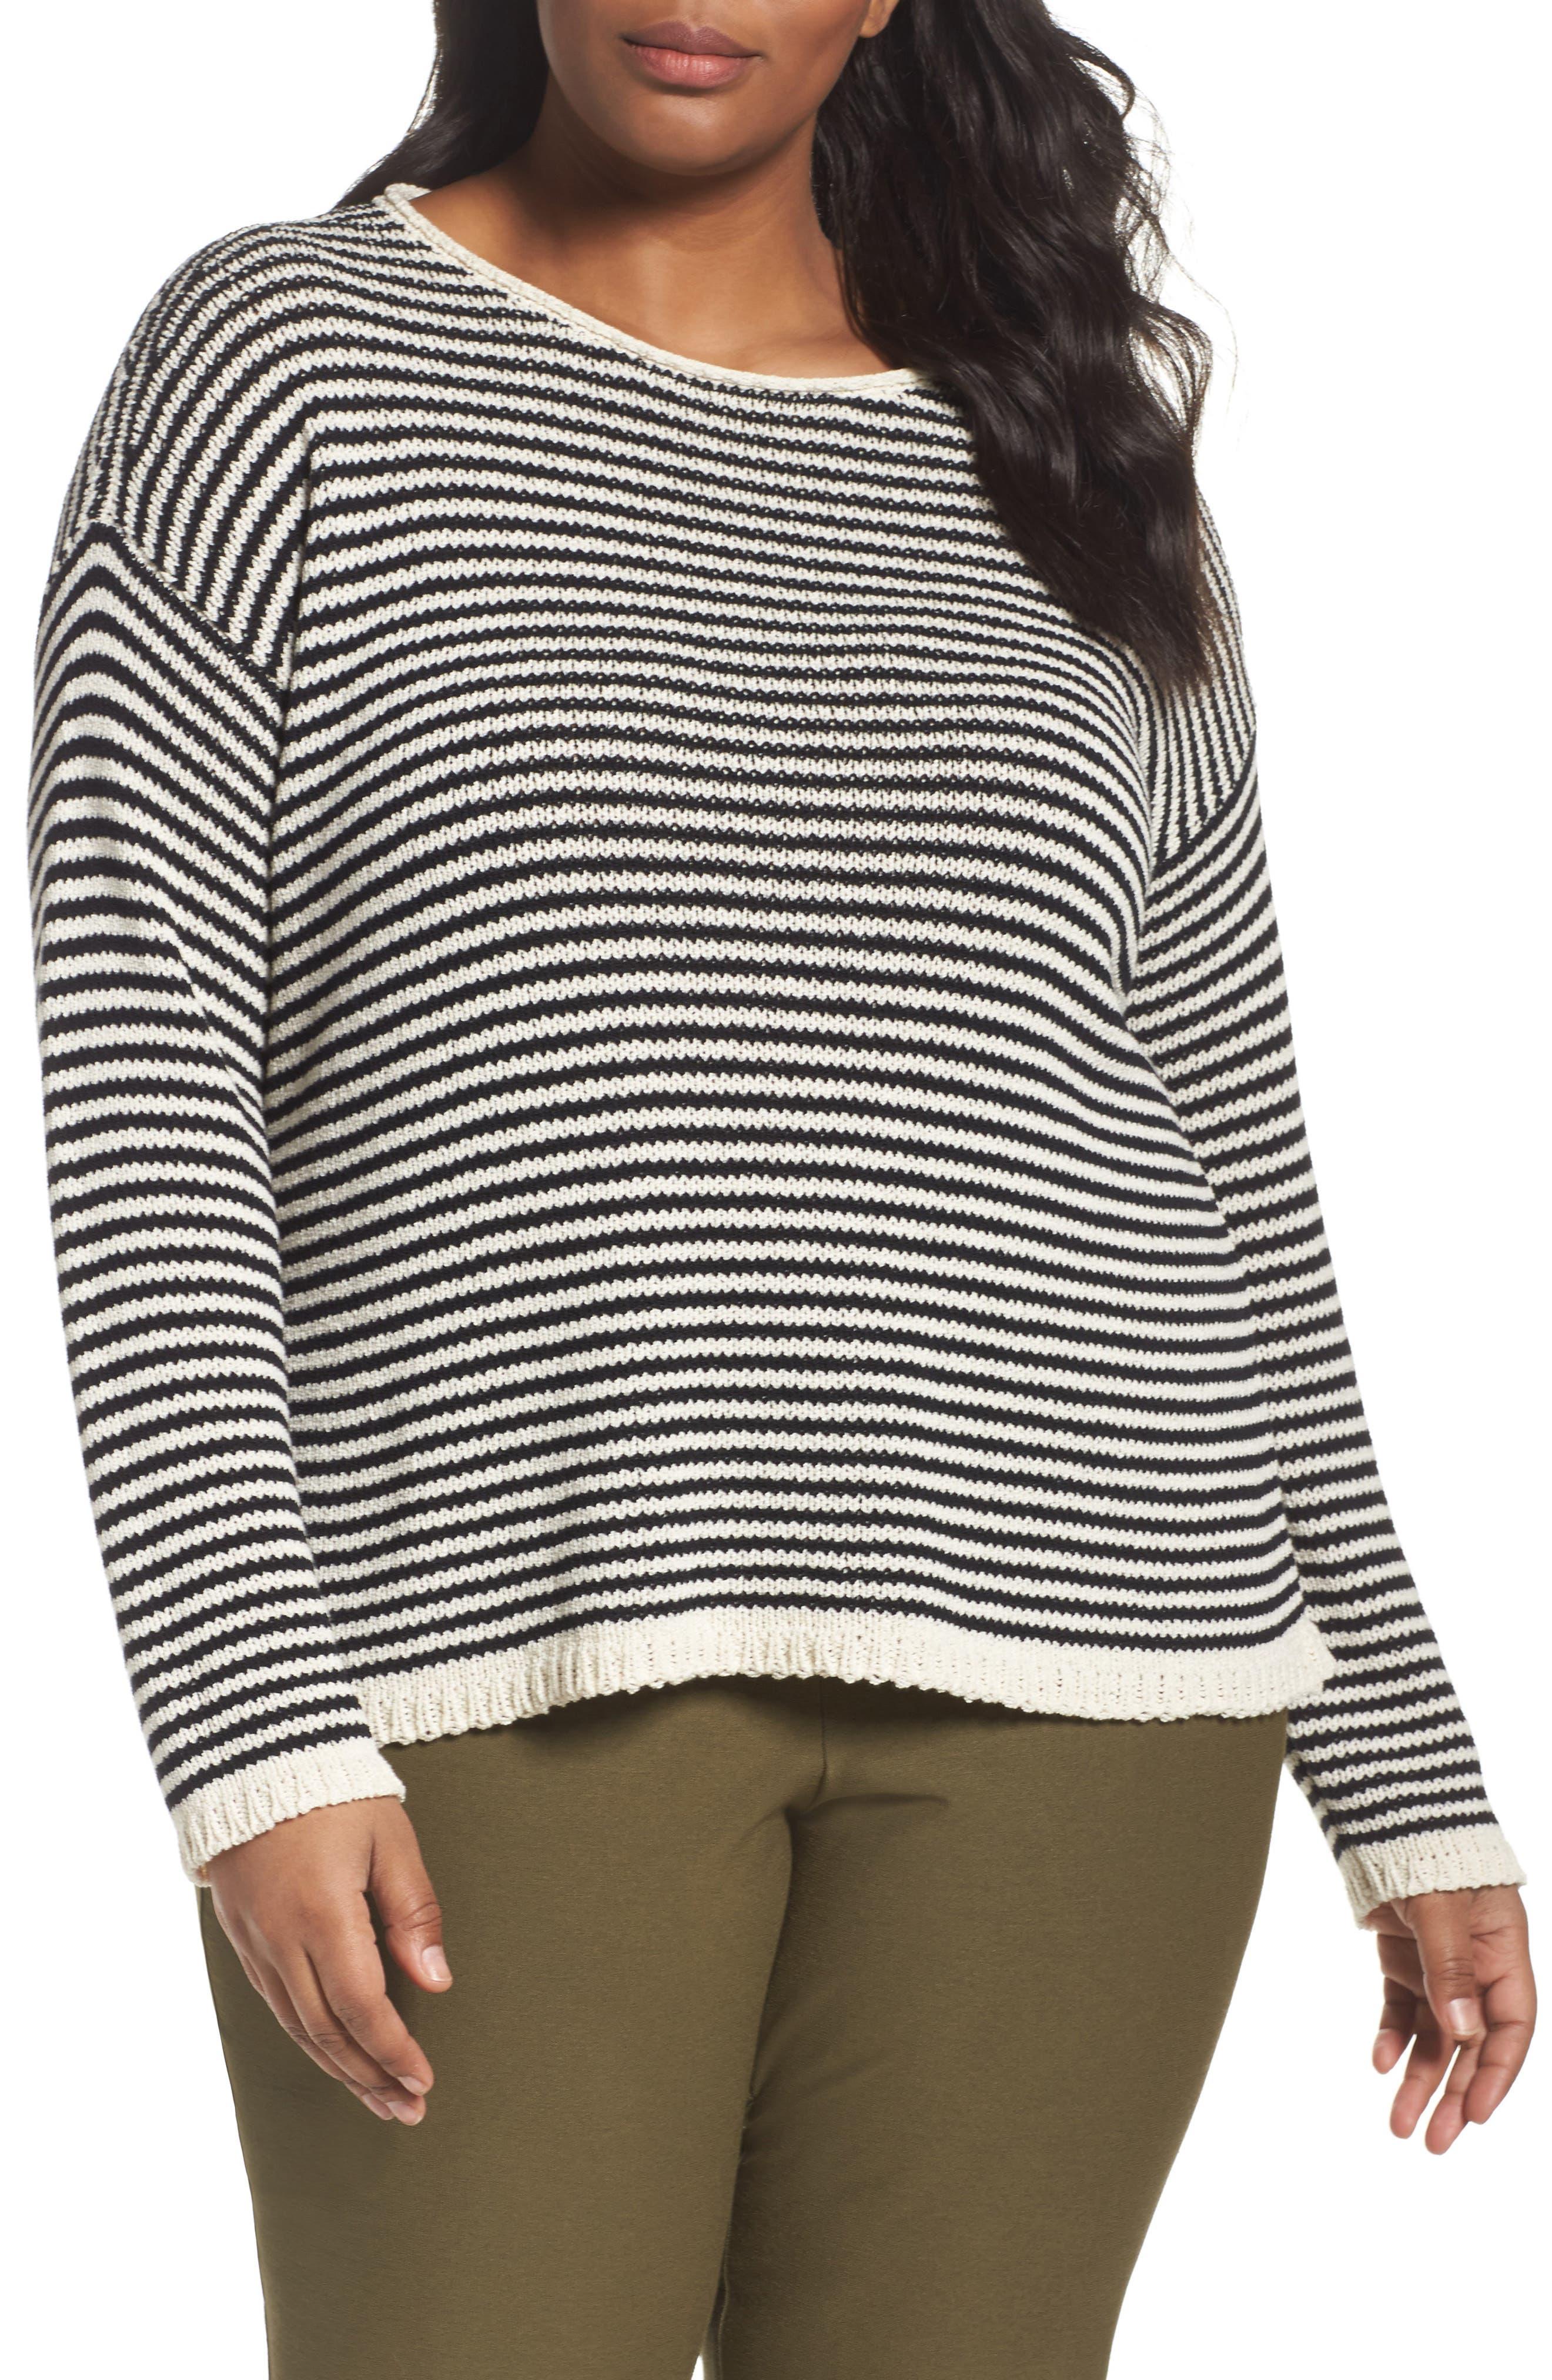 Main Image - Eileen Fisher Stripe Cotton Blend Knit Top (Plus Size)